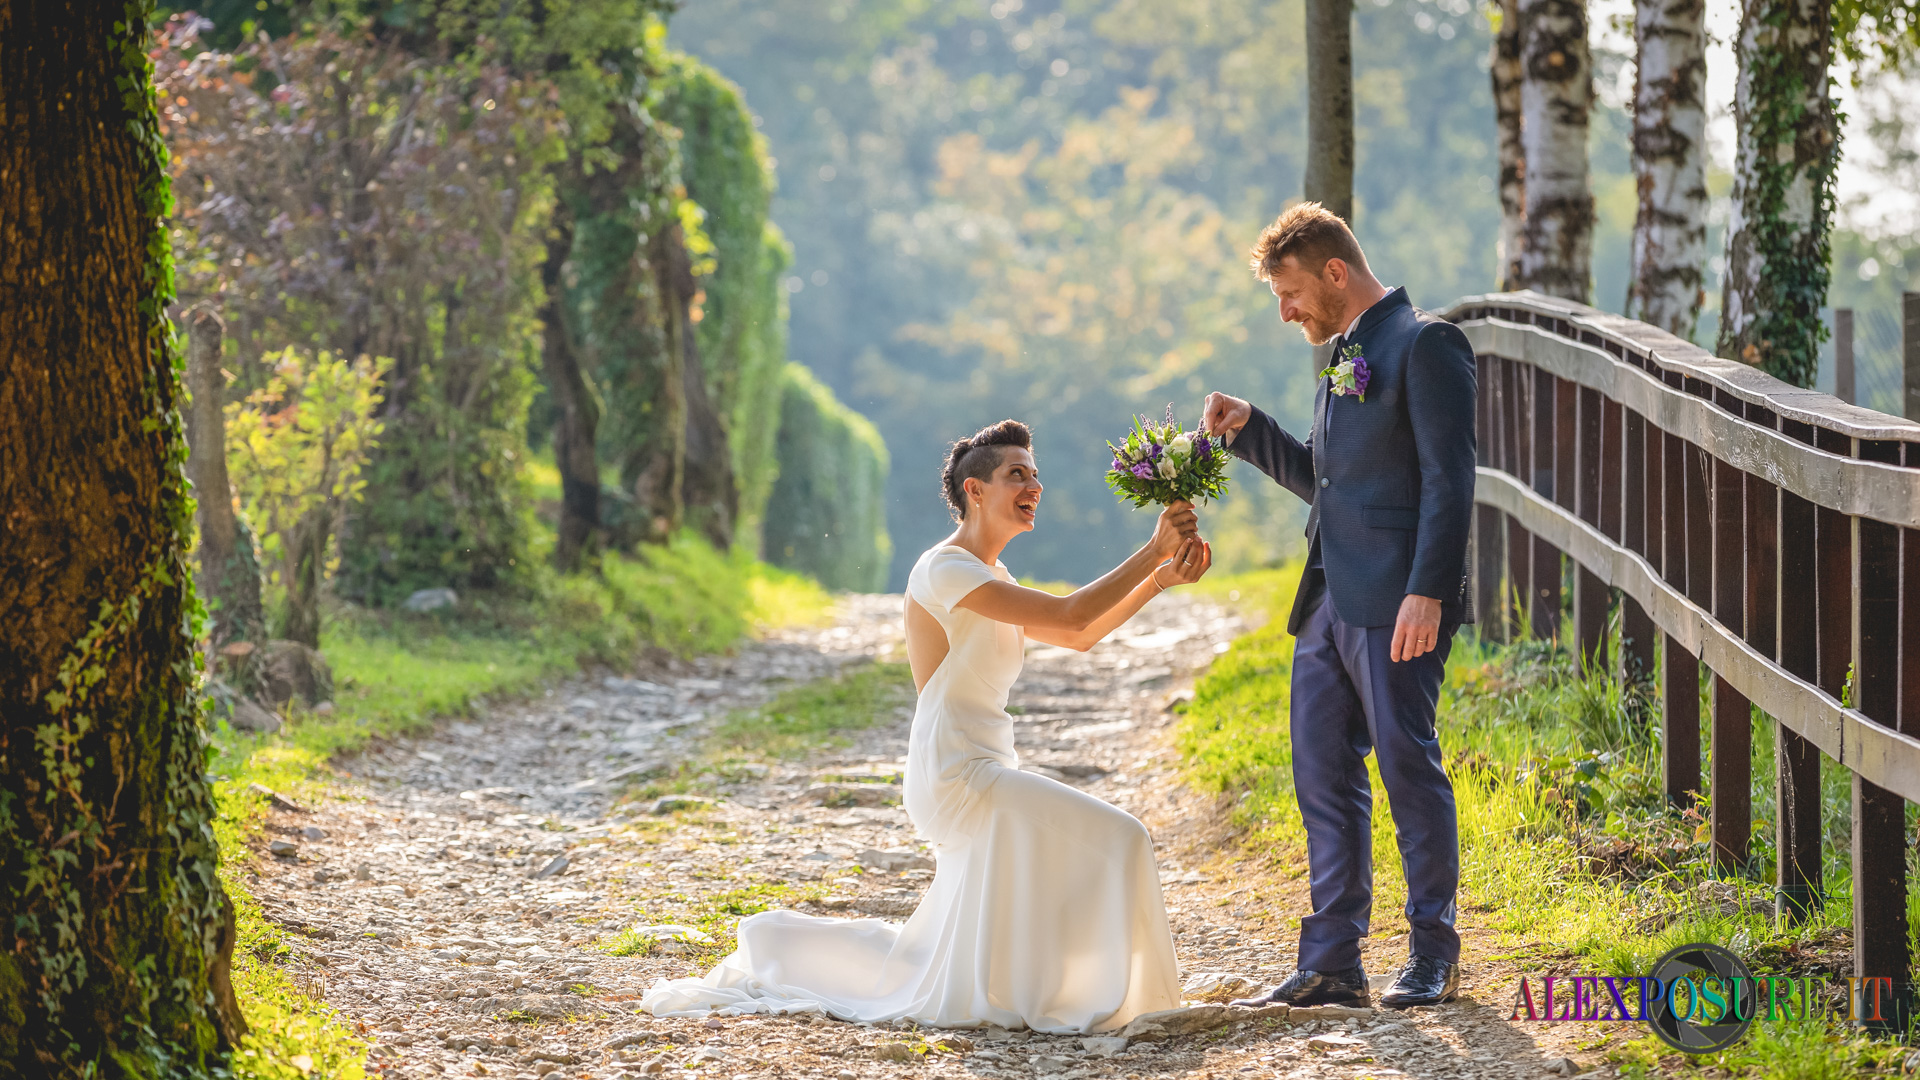 Permalink to: Il Matrimonio